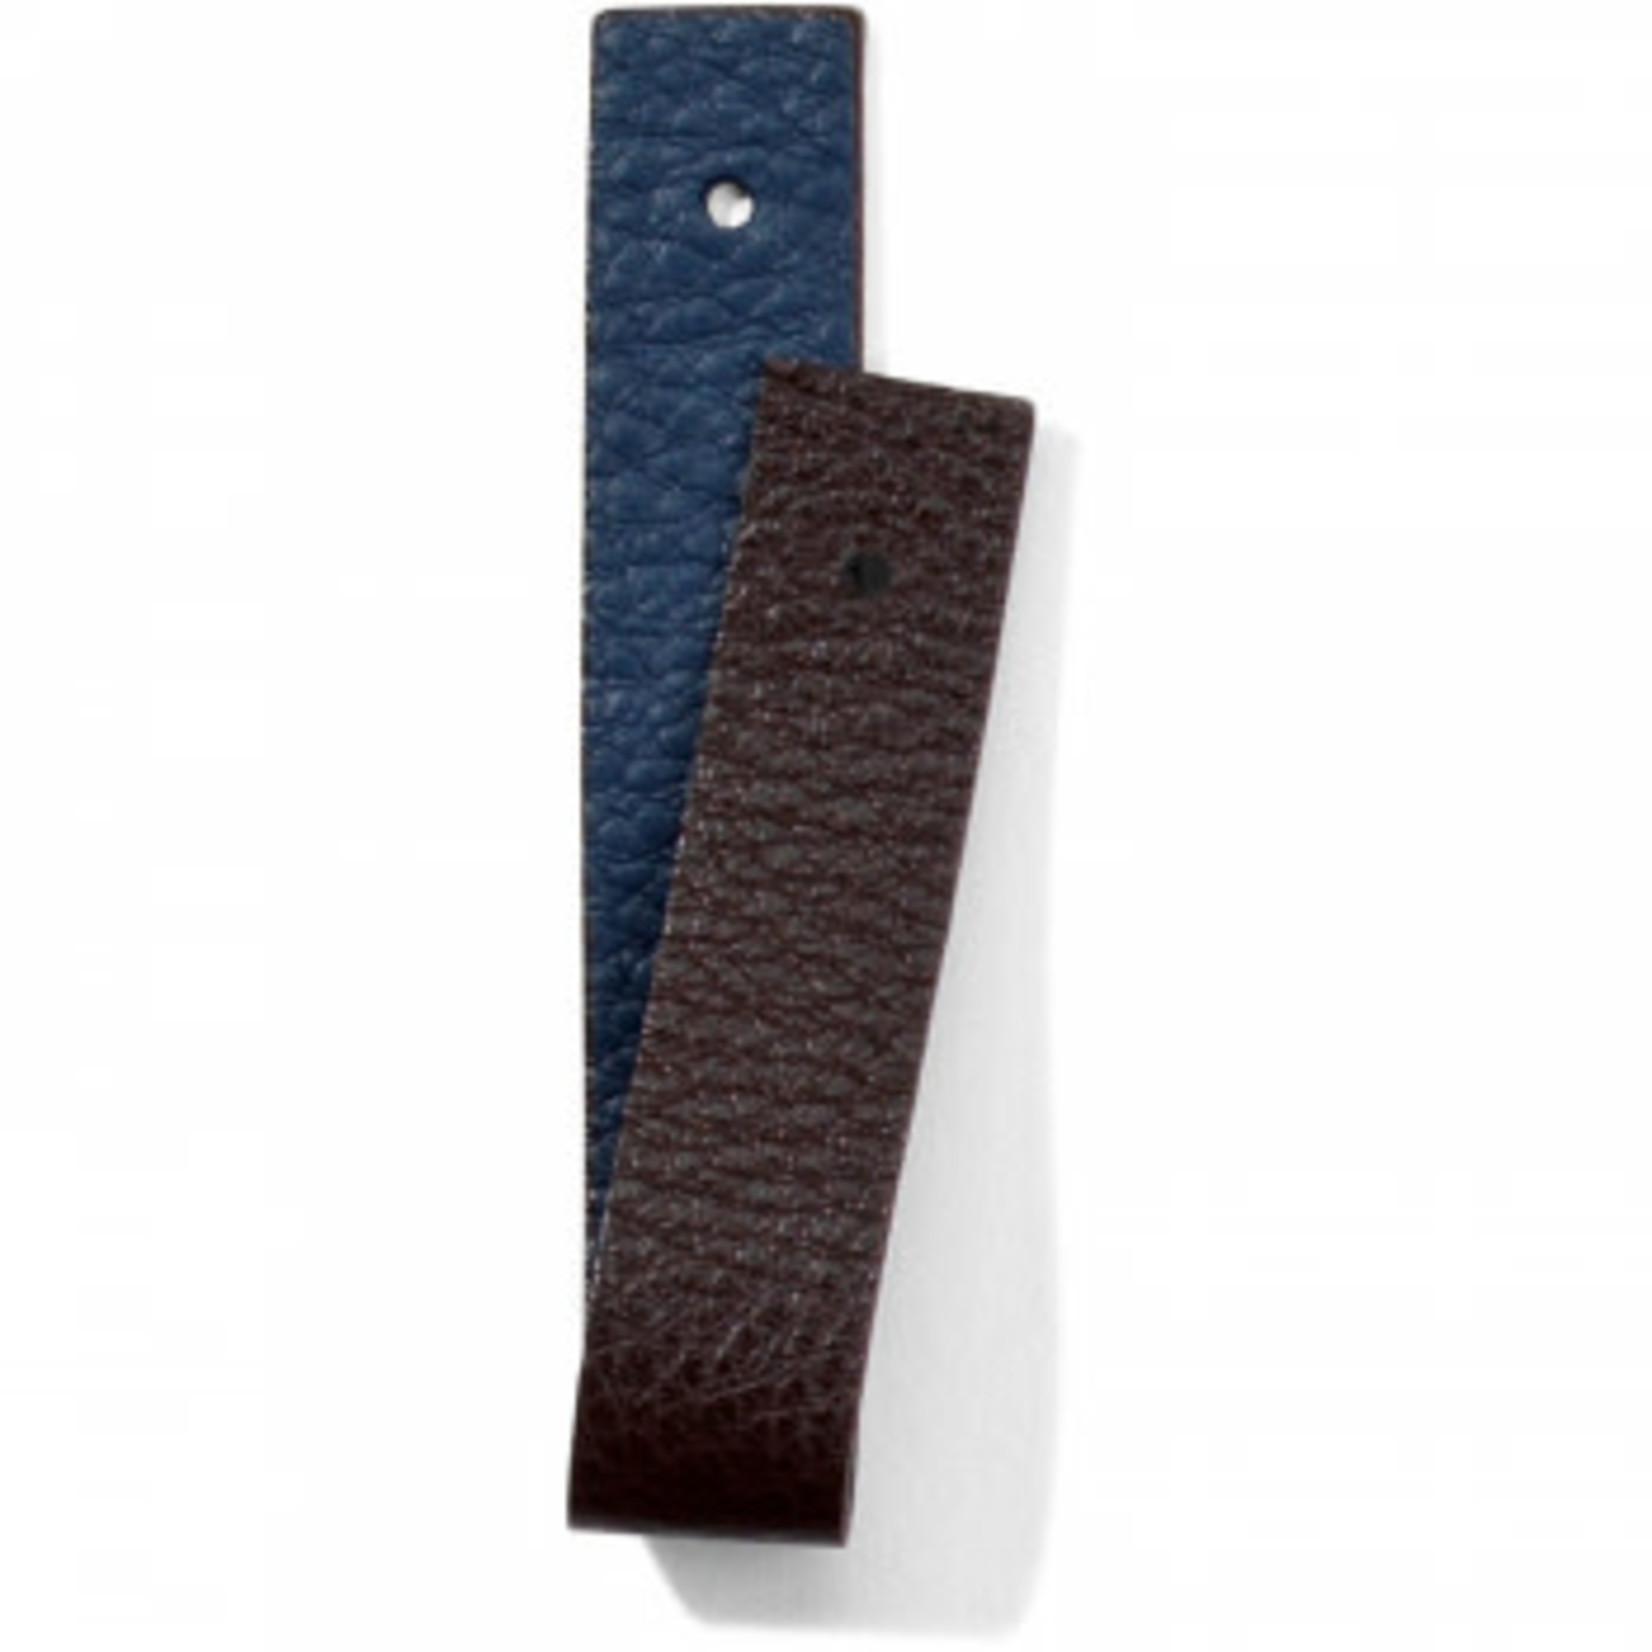 Brighton 63020 Leather/ChristoCuf/BlueChoco